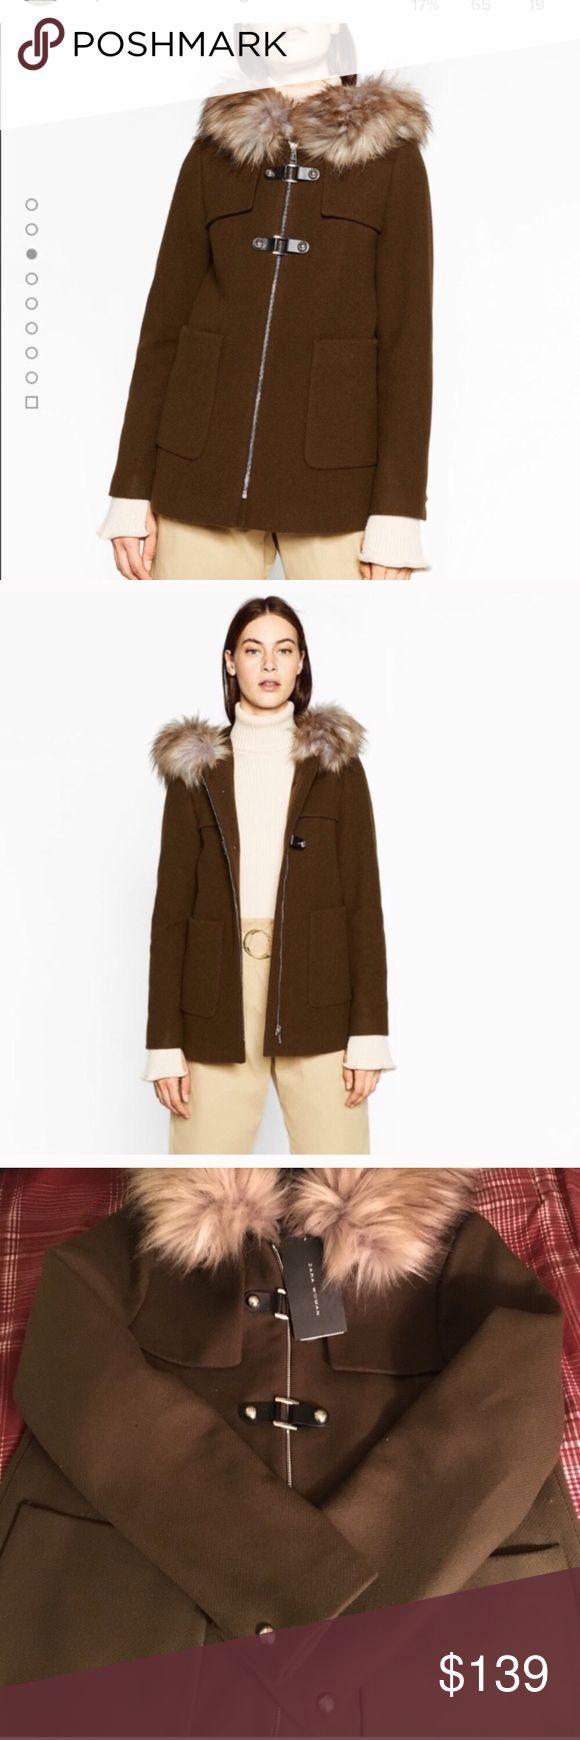 Zara Woman Duffle Coat Brand new with tags, never worn, Khaki color, super cozy with fur around its hood❤ Zara Jackets & Coats